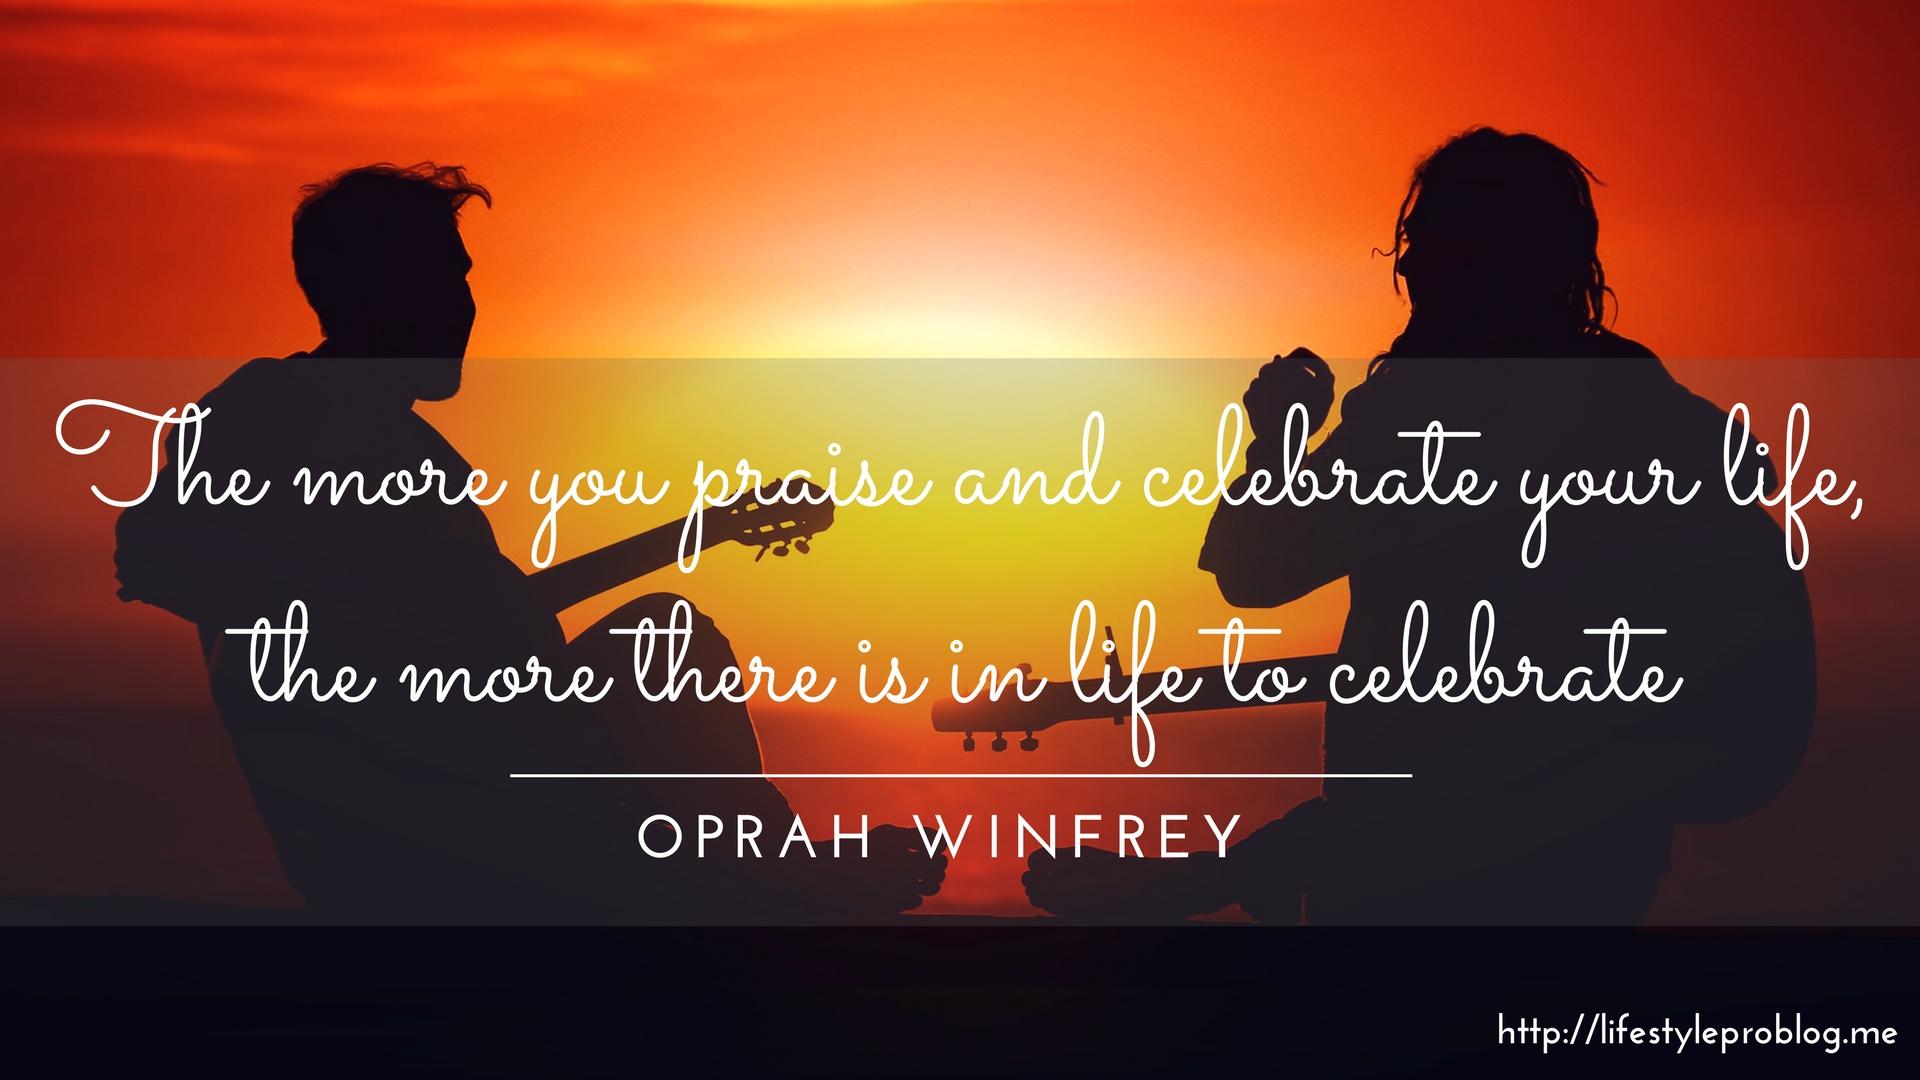 #AtoZChallenge : Oprah Winfrey Quote